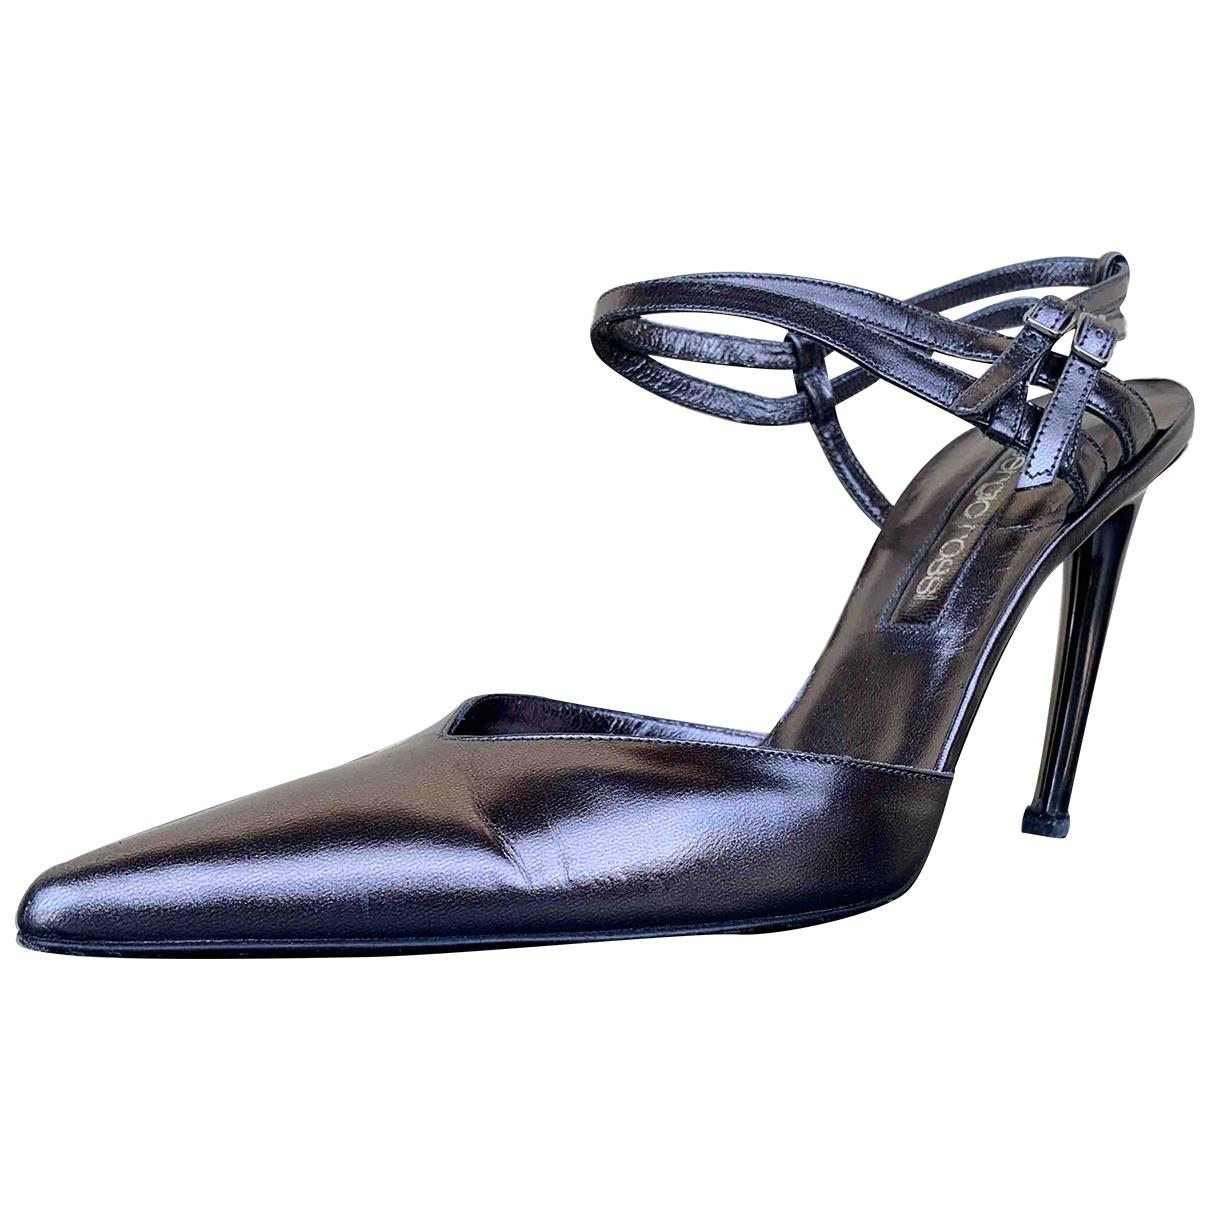 Sergio Rossi \N Leather Heels for Women 37.5 EU